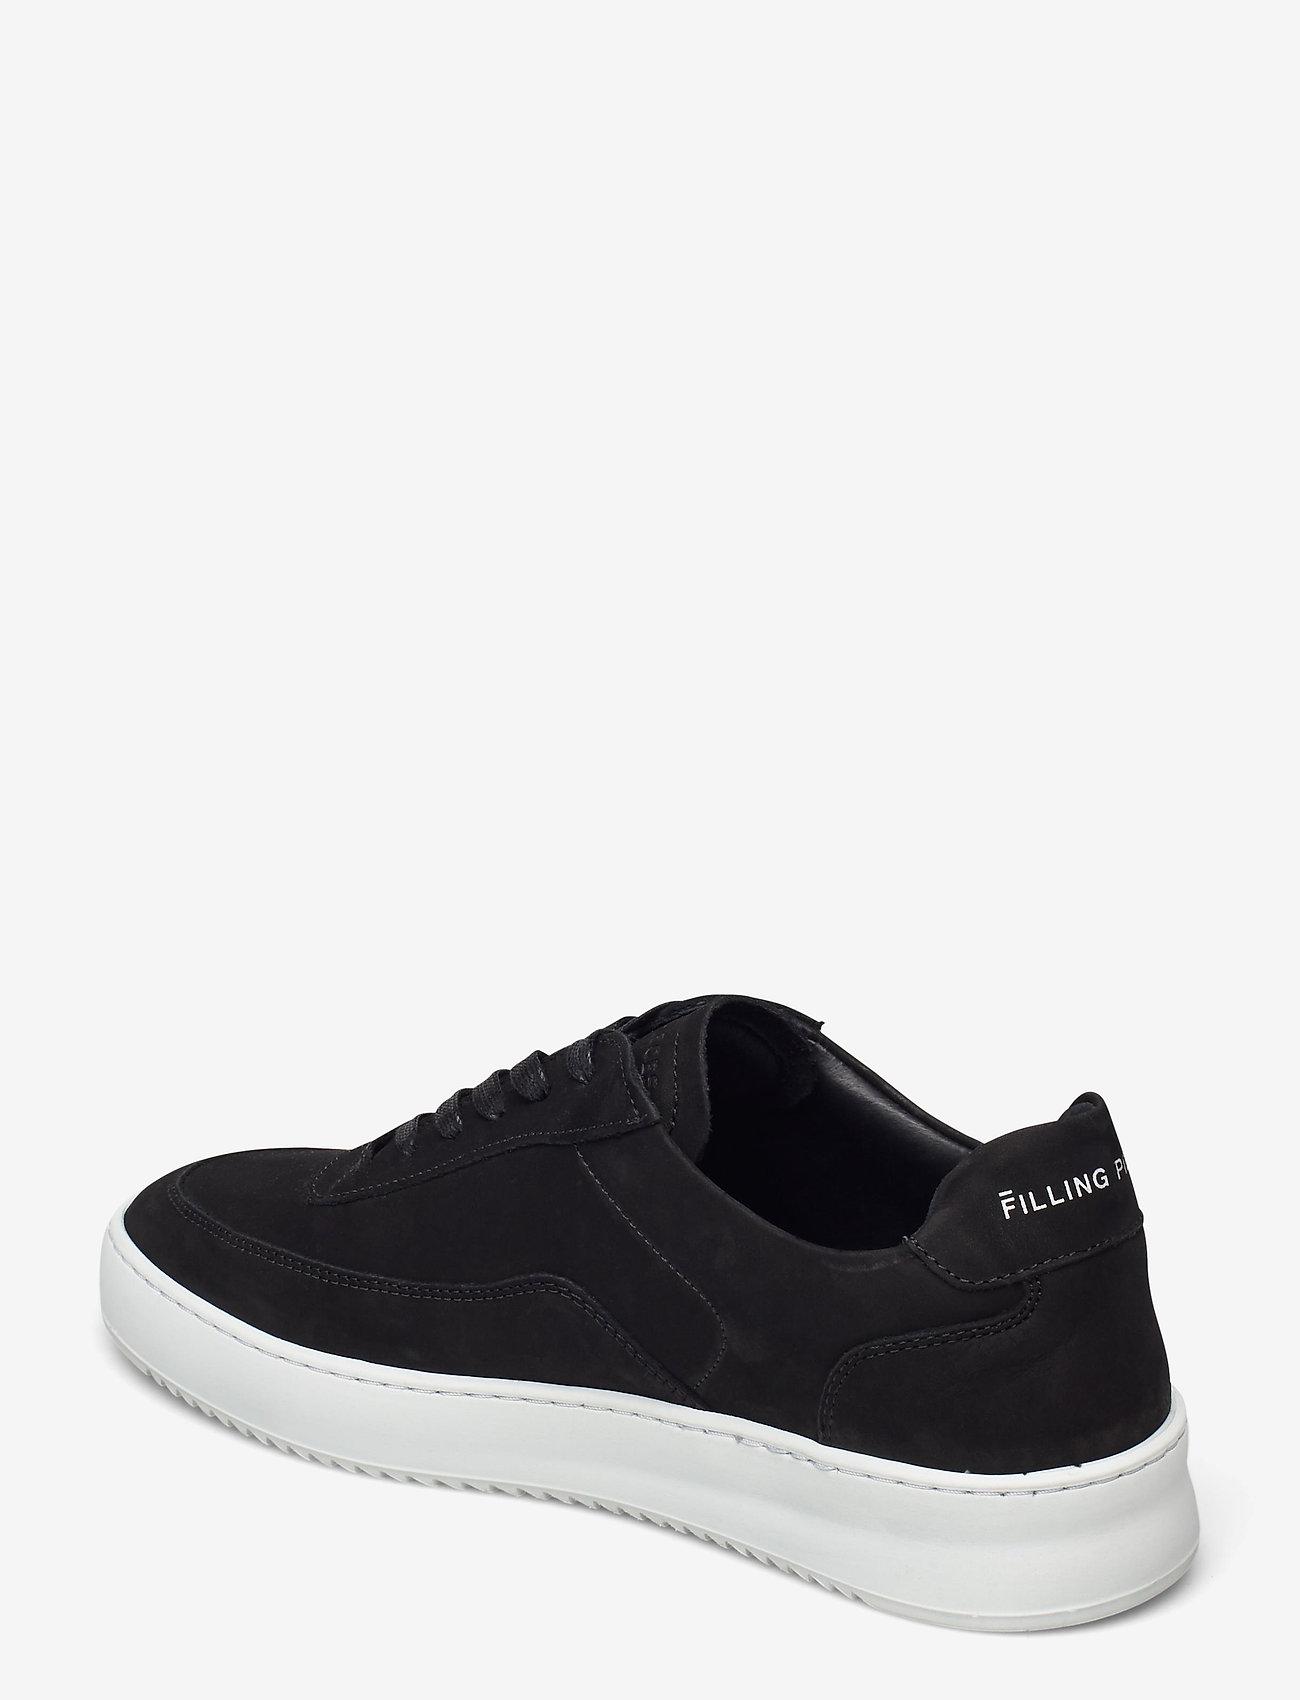 Filling Pieces - Mondo 2.0 Ripple Nubuck - låga sneakers - black - 2